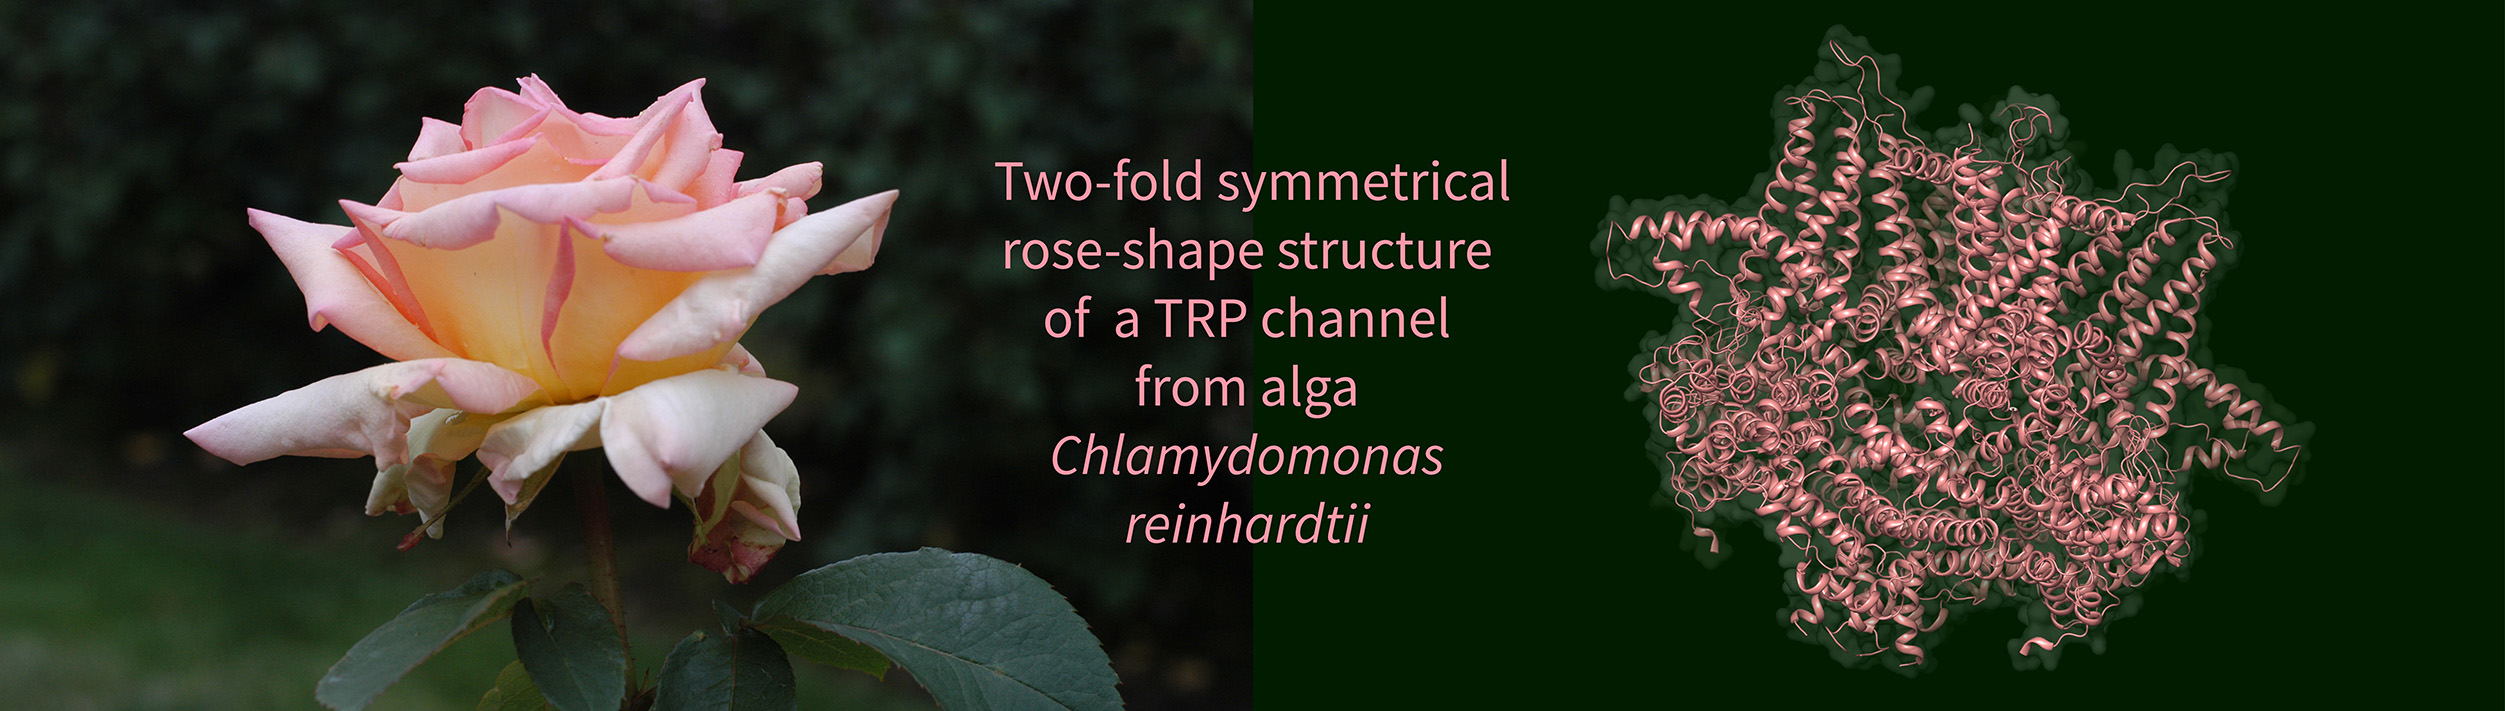 Alga Chlamydomonas Reinhardtii